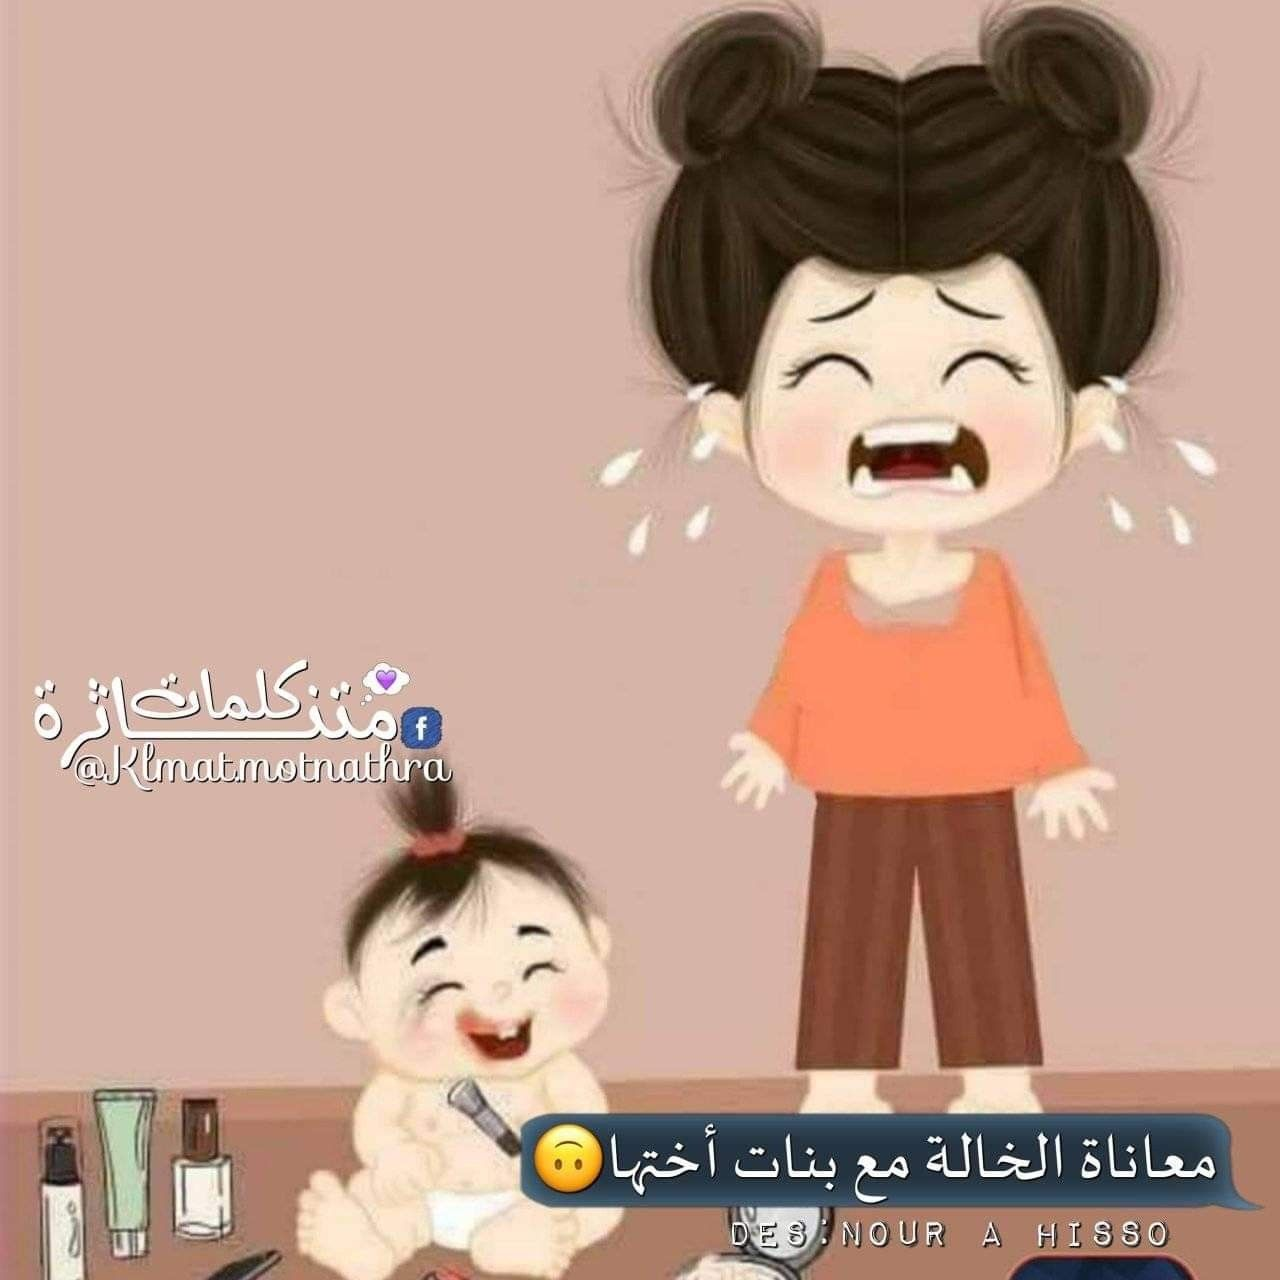 Pin By فلسطينية ولي الفخر On دلع بنات Movie Posters Poster Incoming Call Screenshot